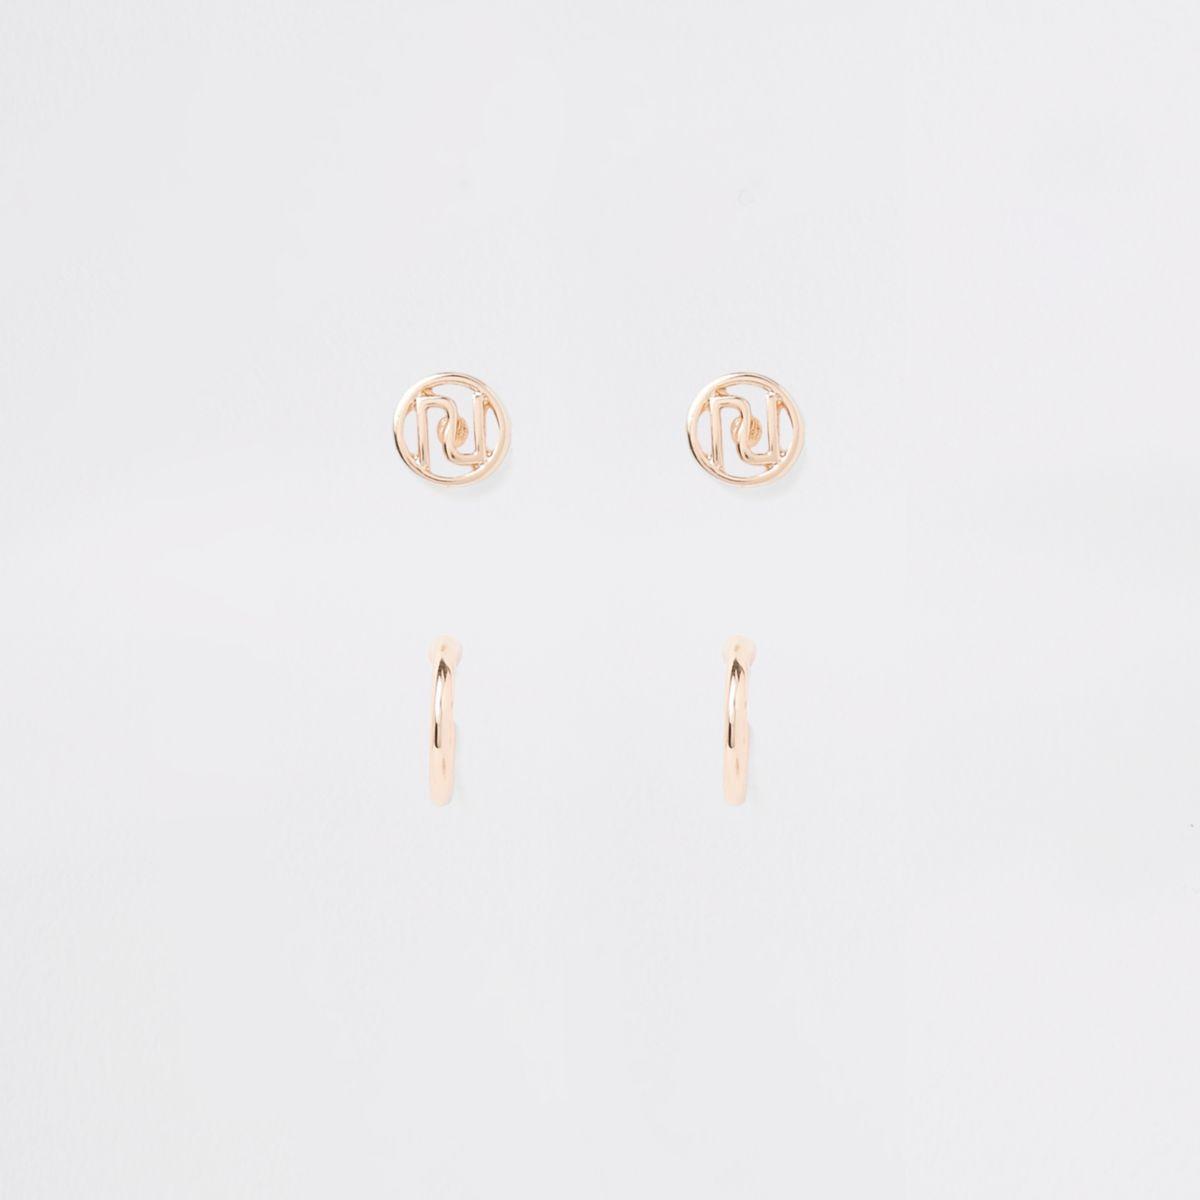 Gold tone RI stud earring stud multipack